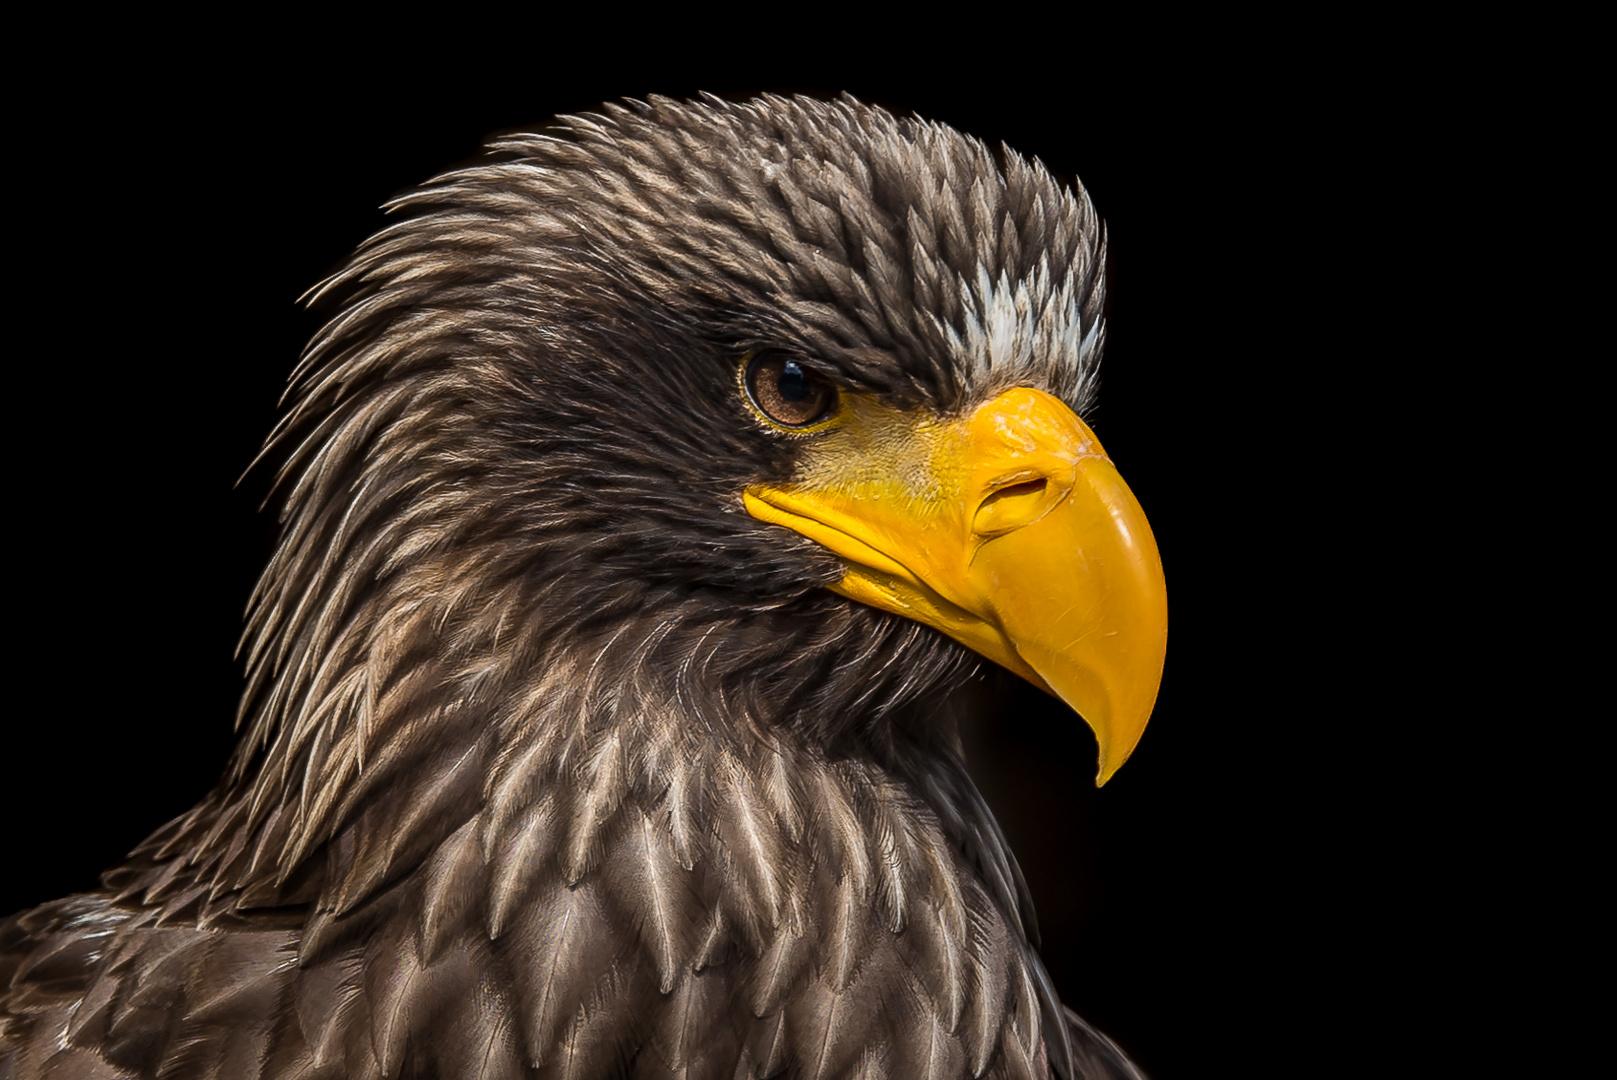 posing eagle